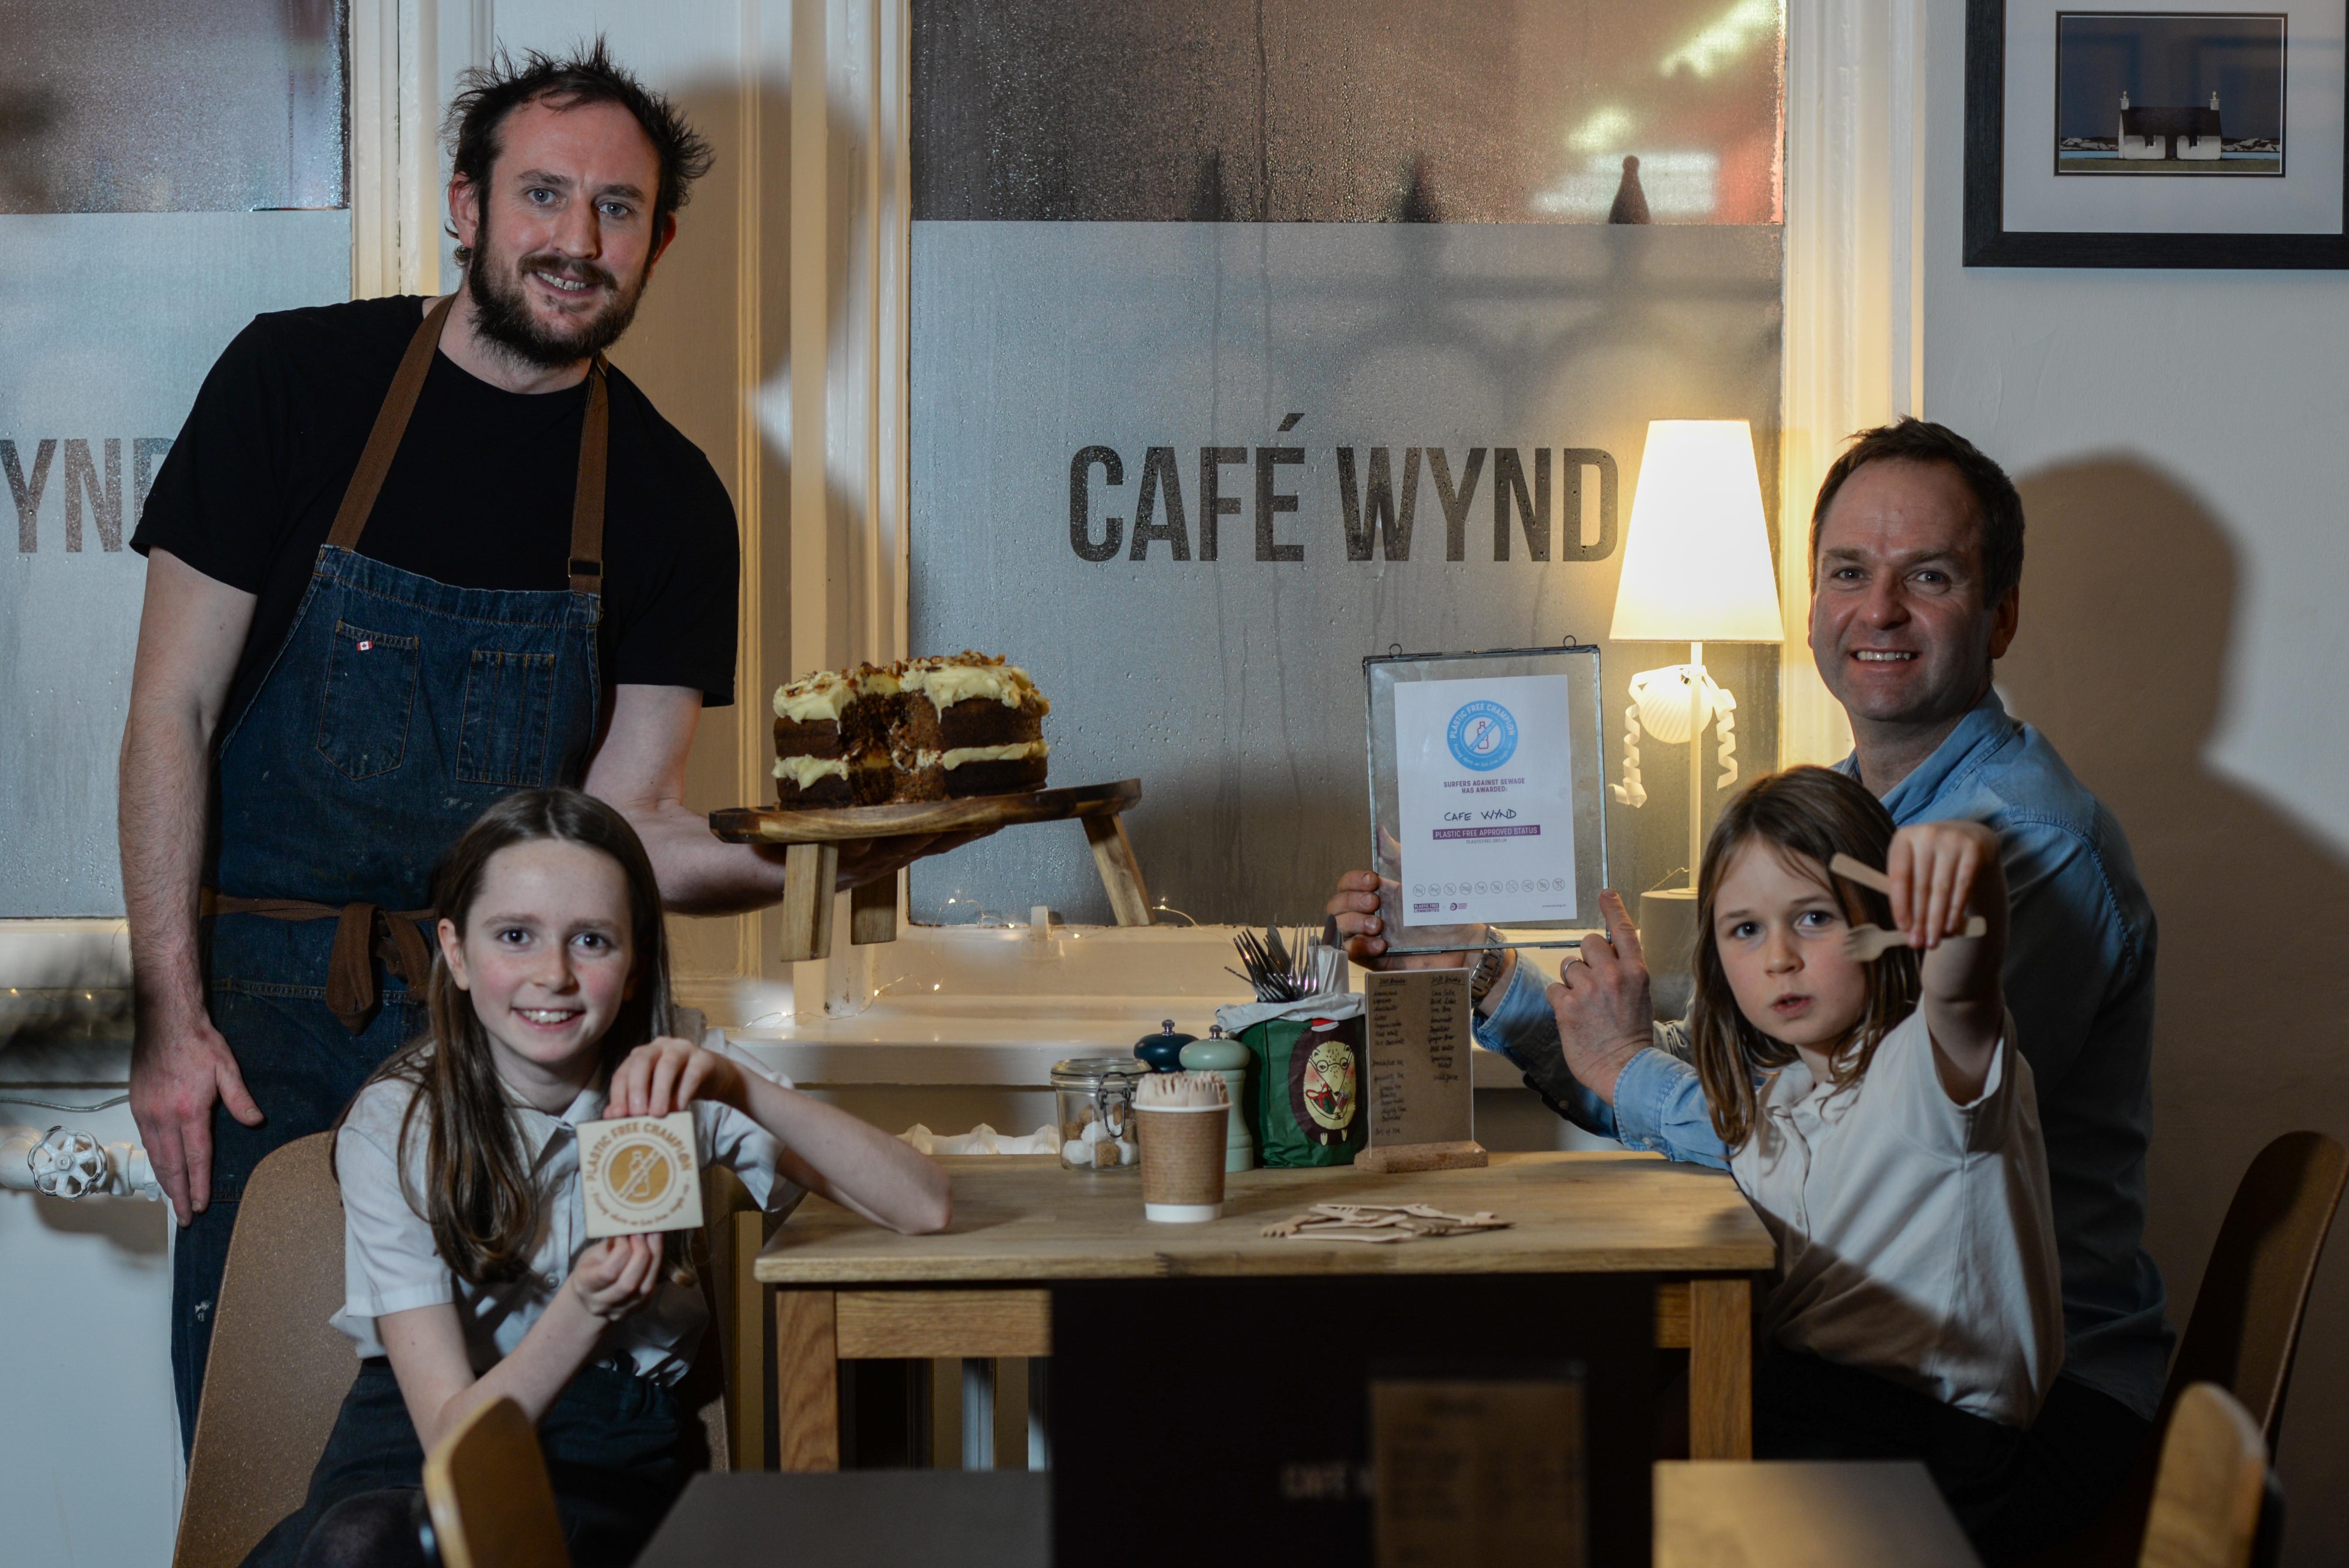 Champion award winner Stewart Forrest with Plastic-Free Dunfermline founder James Daw and Amelia and Maisie Daw.